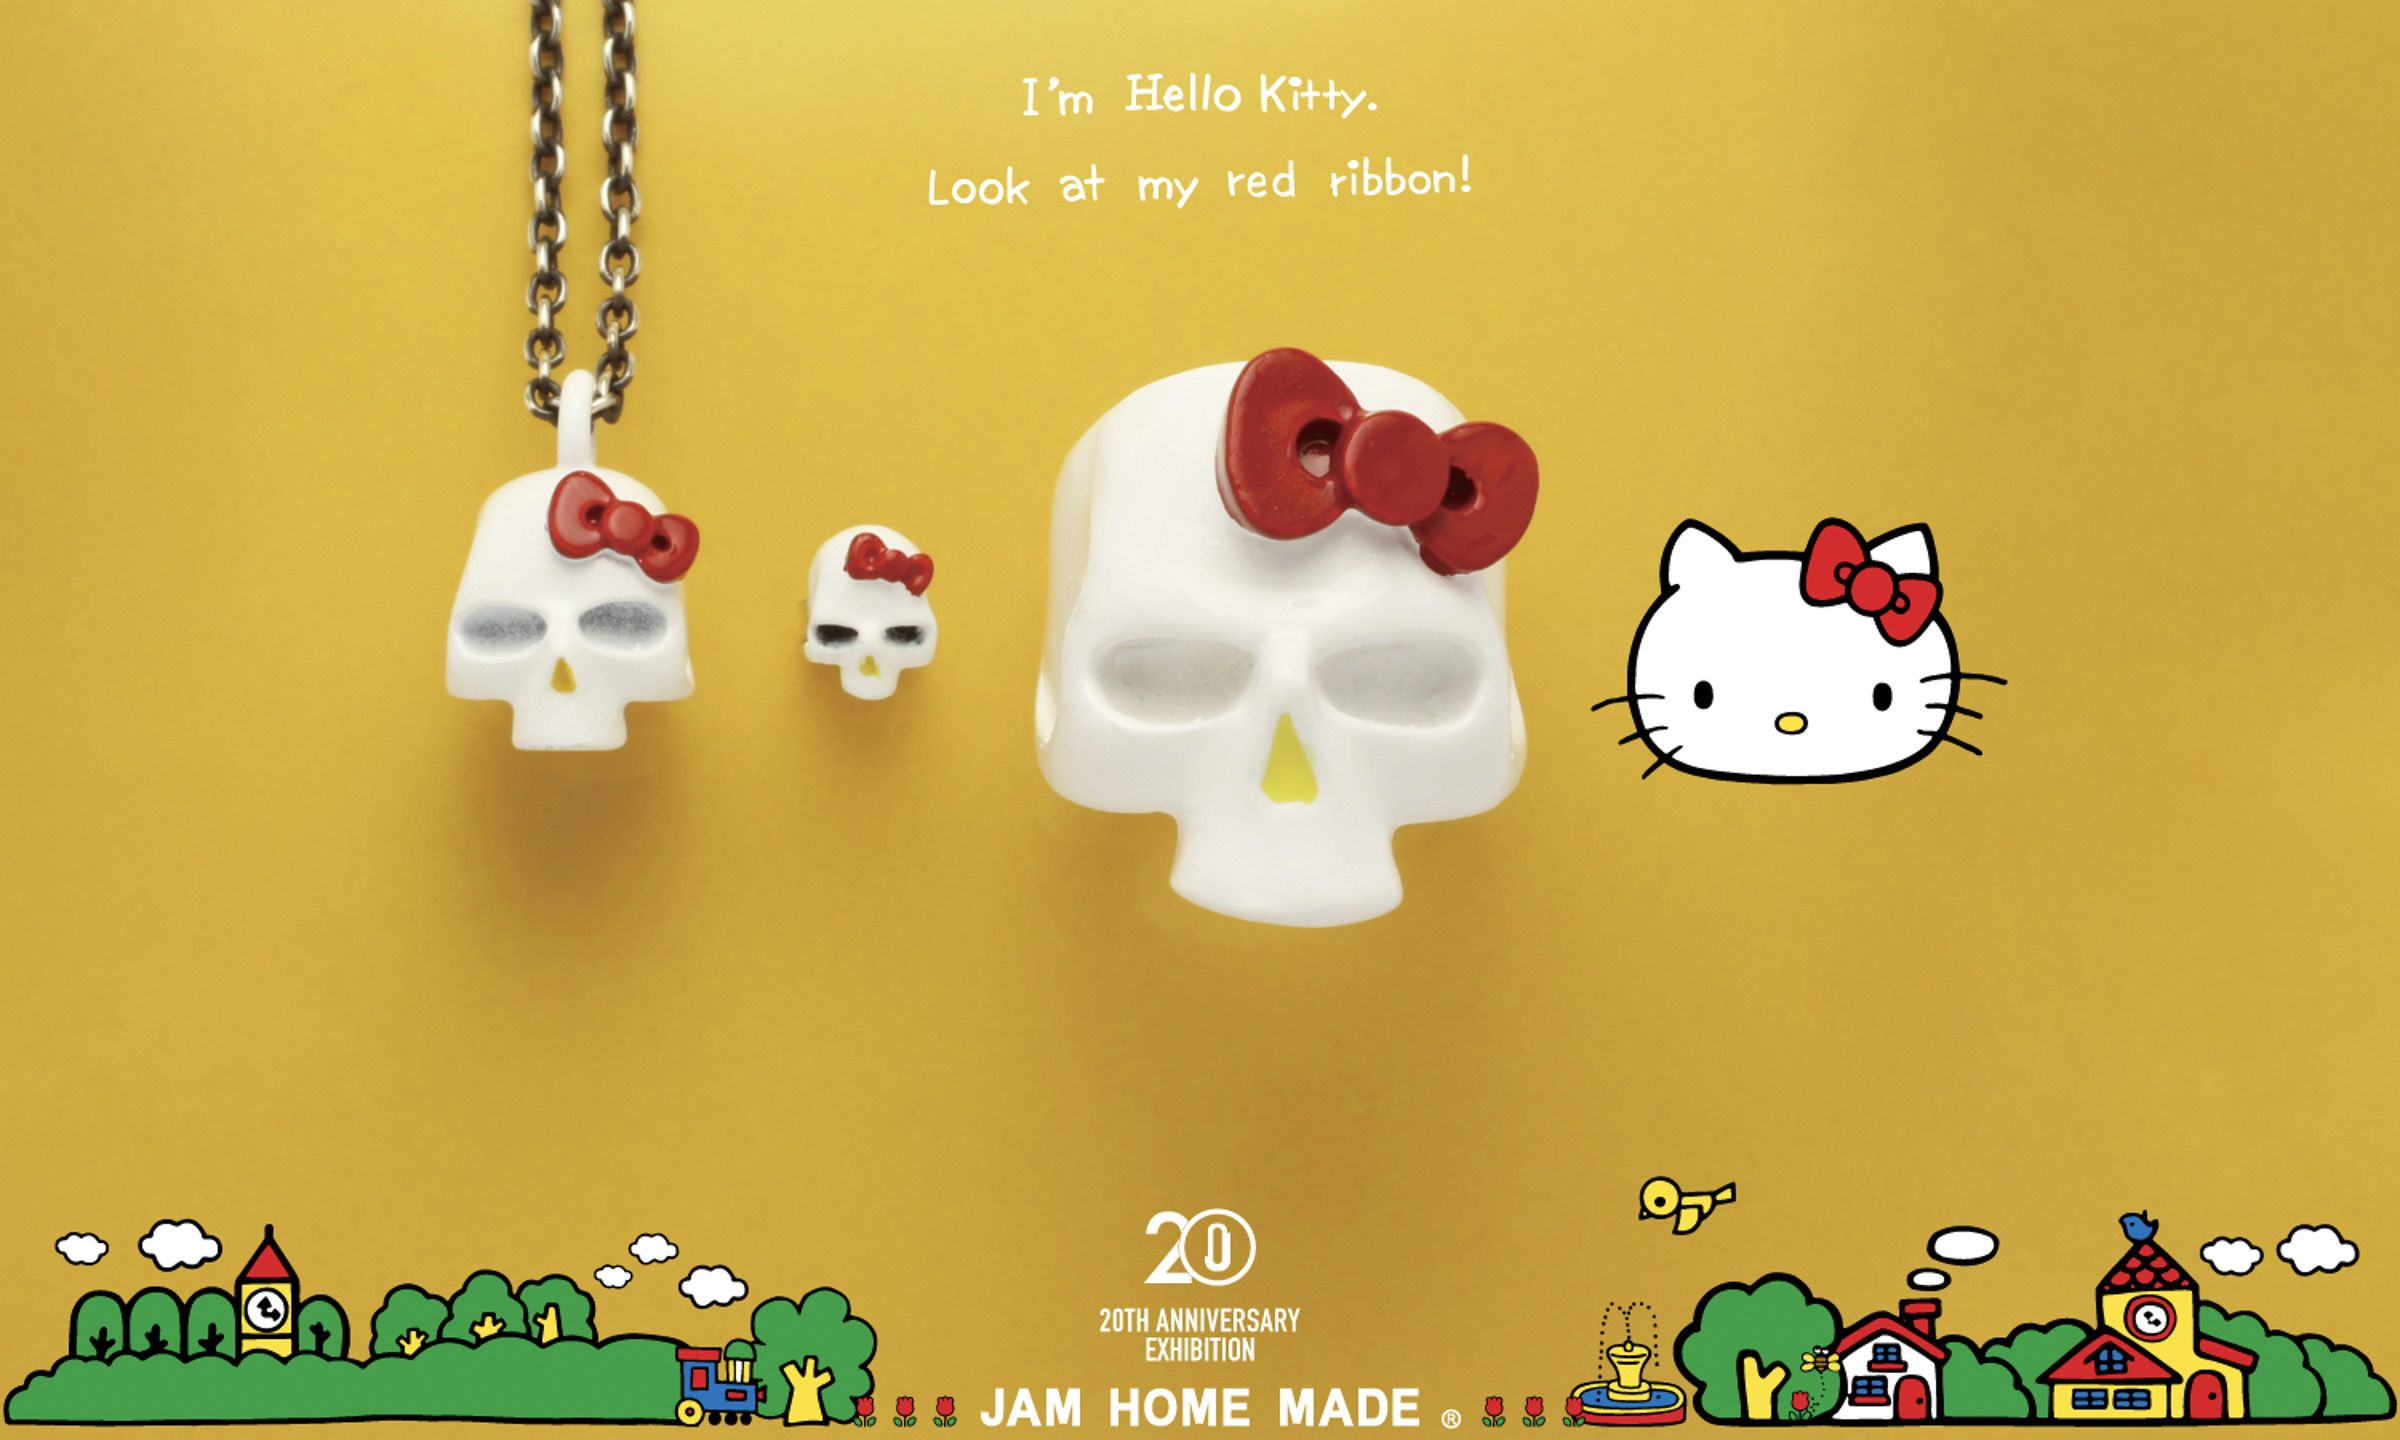 Pin by Ash Wang on Lookbook Red ribbon, Hello kitty